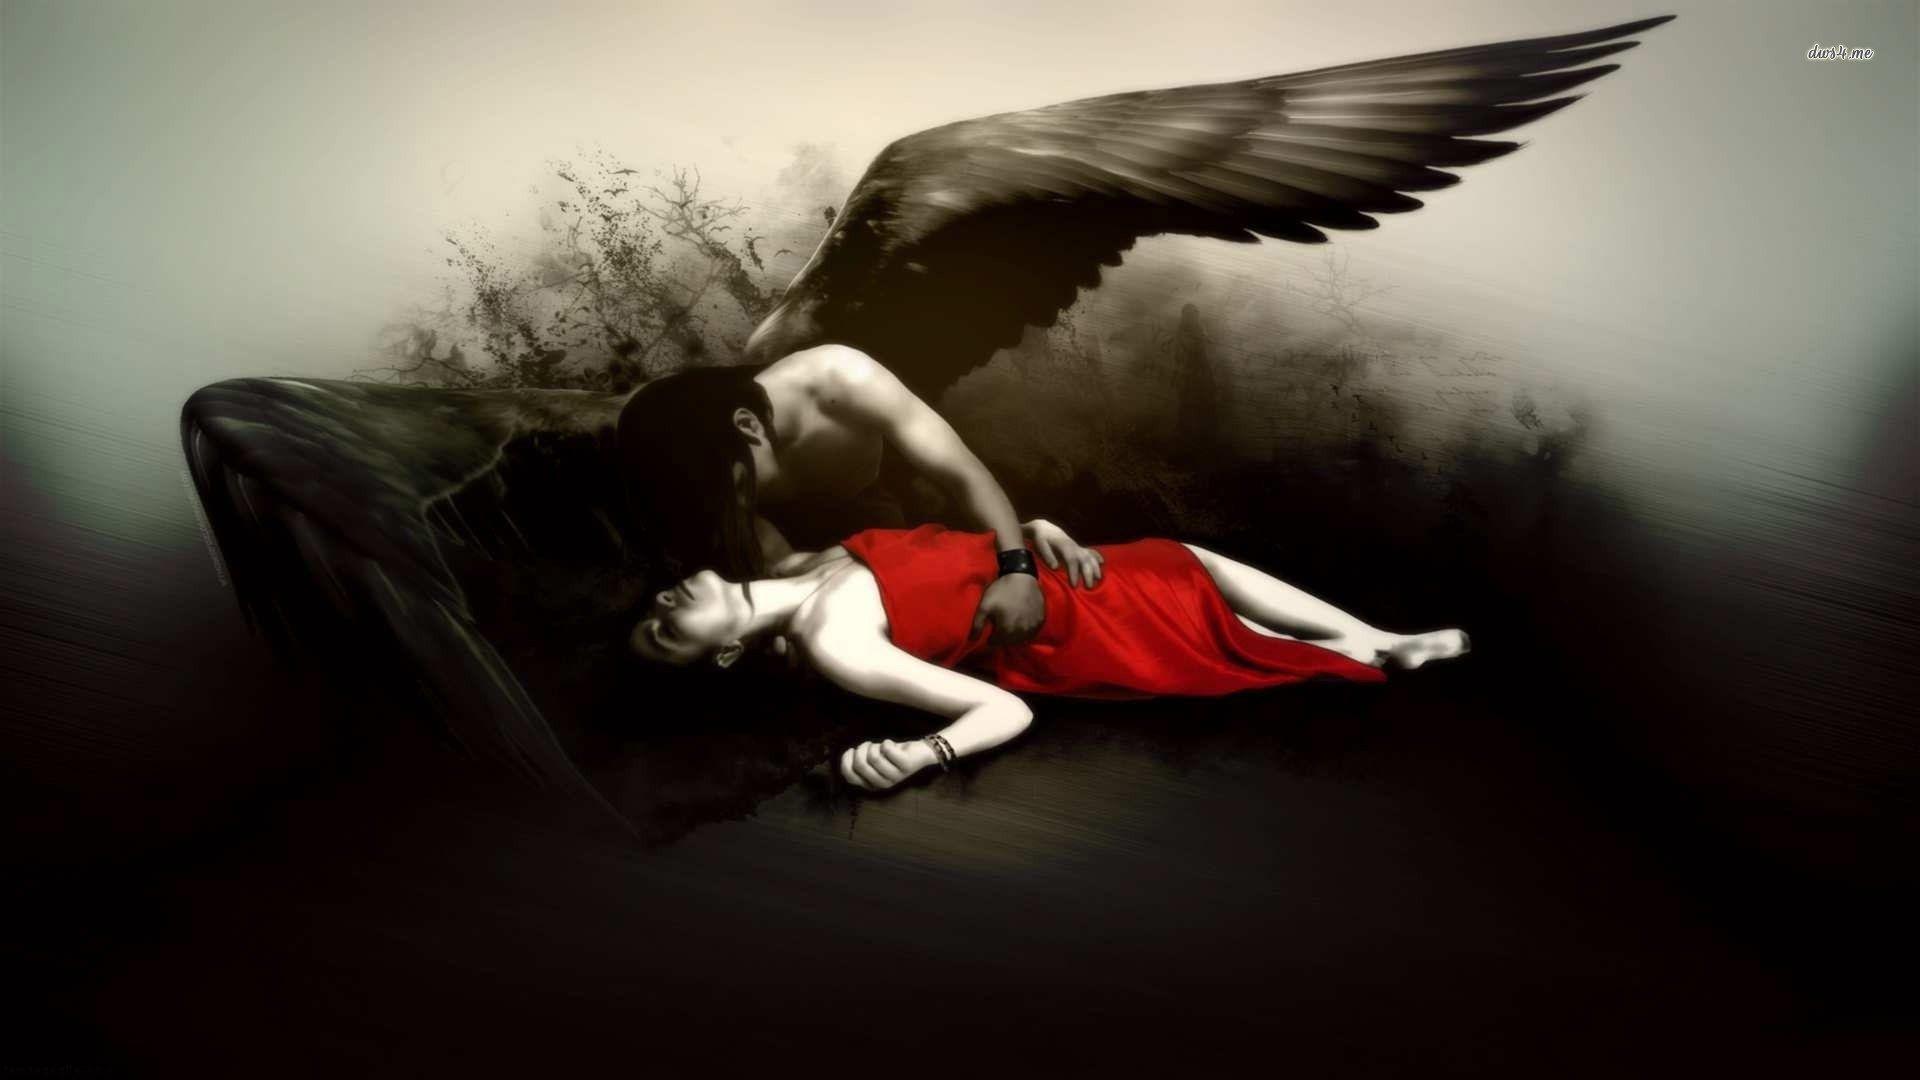 Angel Of Death Wallpaper FREE Download Angel Of Death Wallpaper